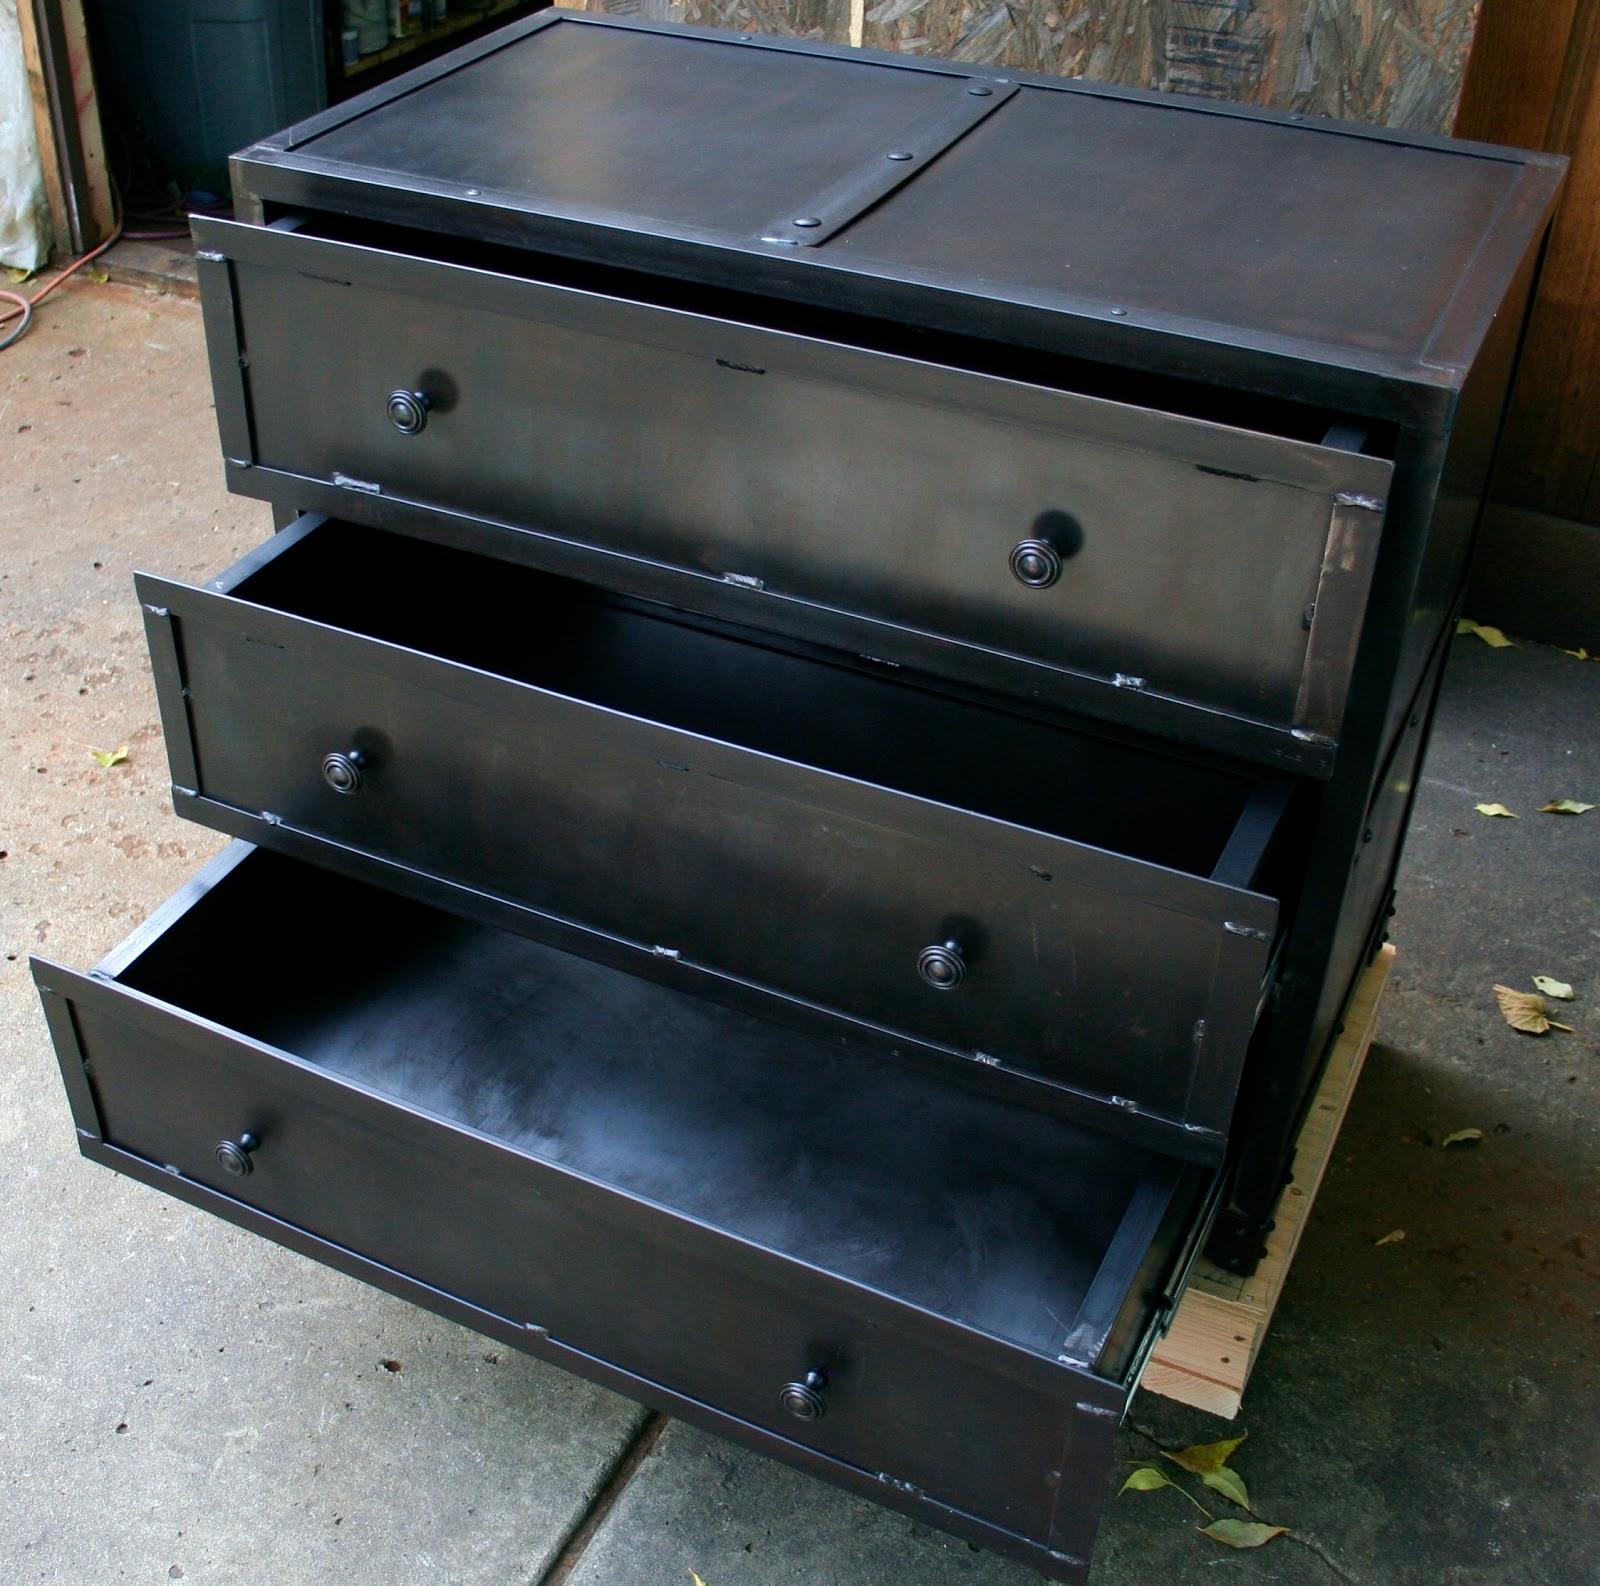 Real Industrial Edge Furniture Llc: Industrial Metal Chest